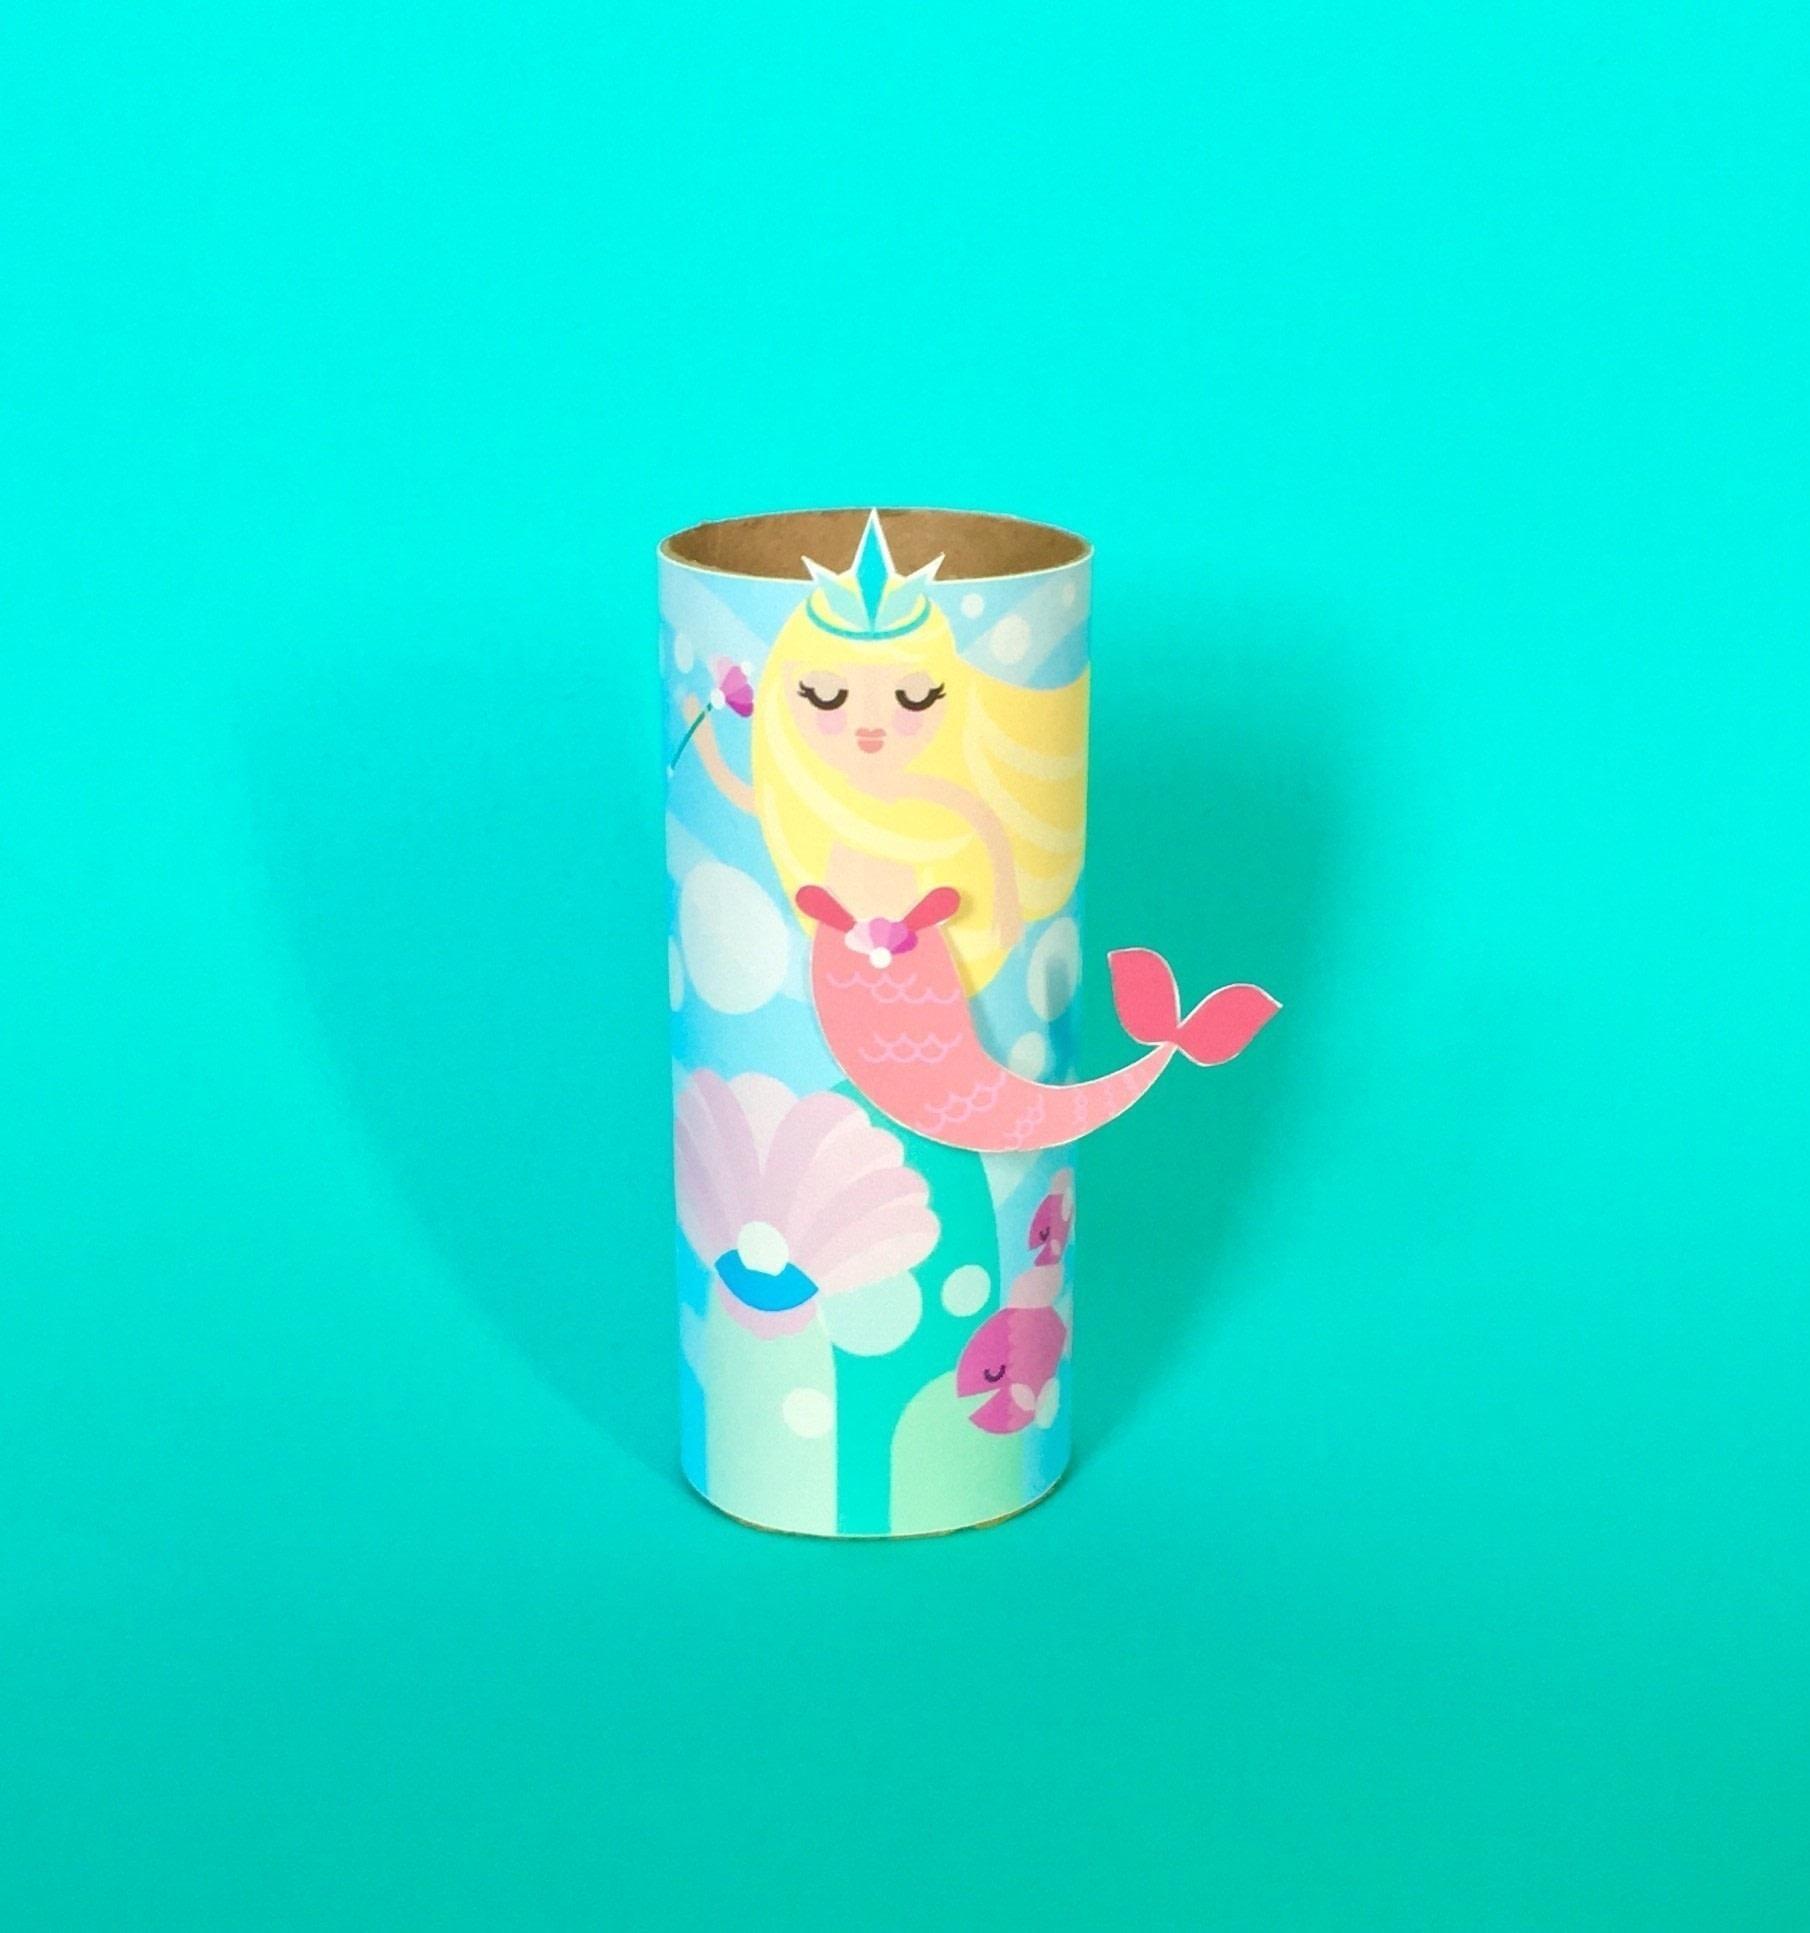 Mermaid Toilet Tube Craft Printable How To Make A Paper